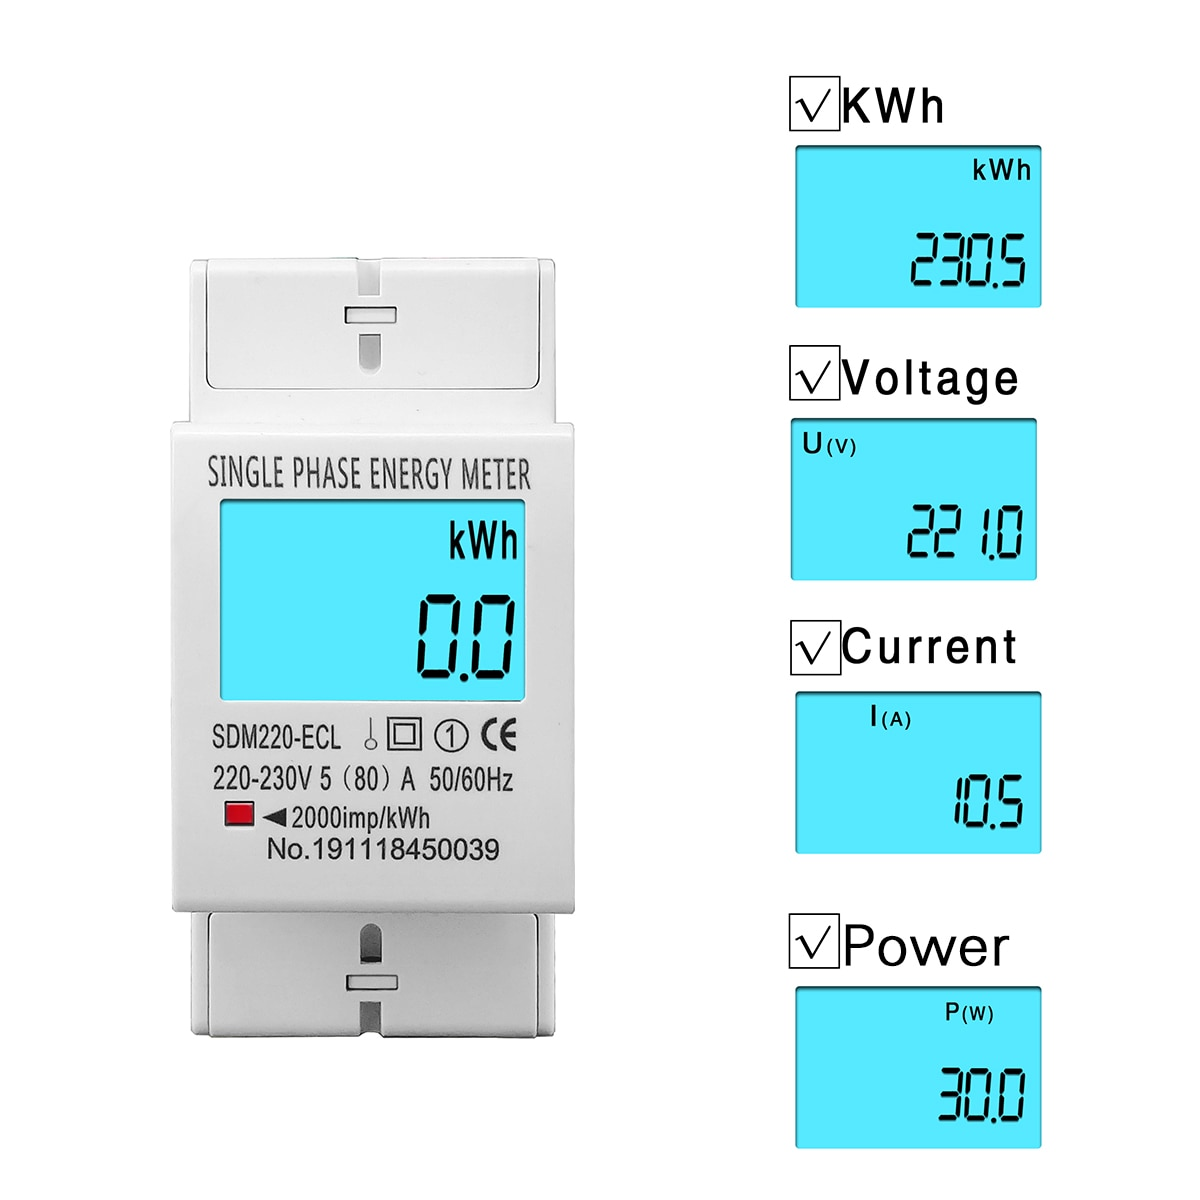 Medidor digital de energia 80a din rail monofásico, tela lcd digital, medidor de consumo de energia kwh ac 220v 230v 50hz/60hz Medidores de energia    -